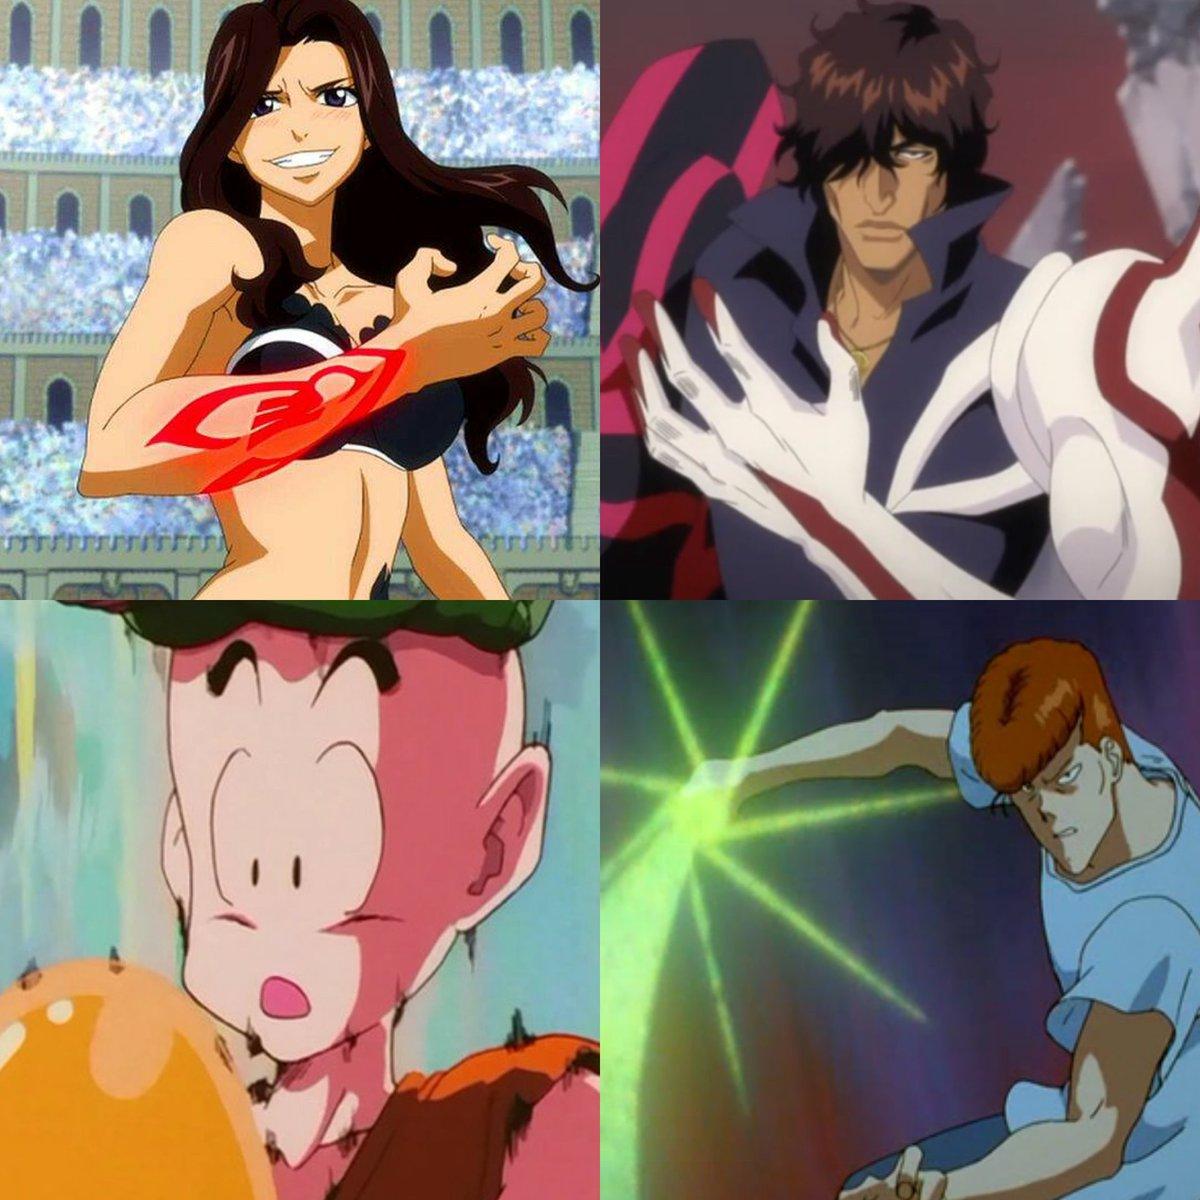 #FairyTail #BLEACH #yuyuhakusho #DragonBallZ #DragonBallSuper #animeselcaday #anime #AnimeArt #AnimeMemes  Anime characters who got power ups only to get playedpic.twitter.com/VXri0guDDy